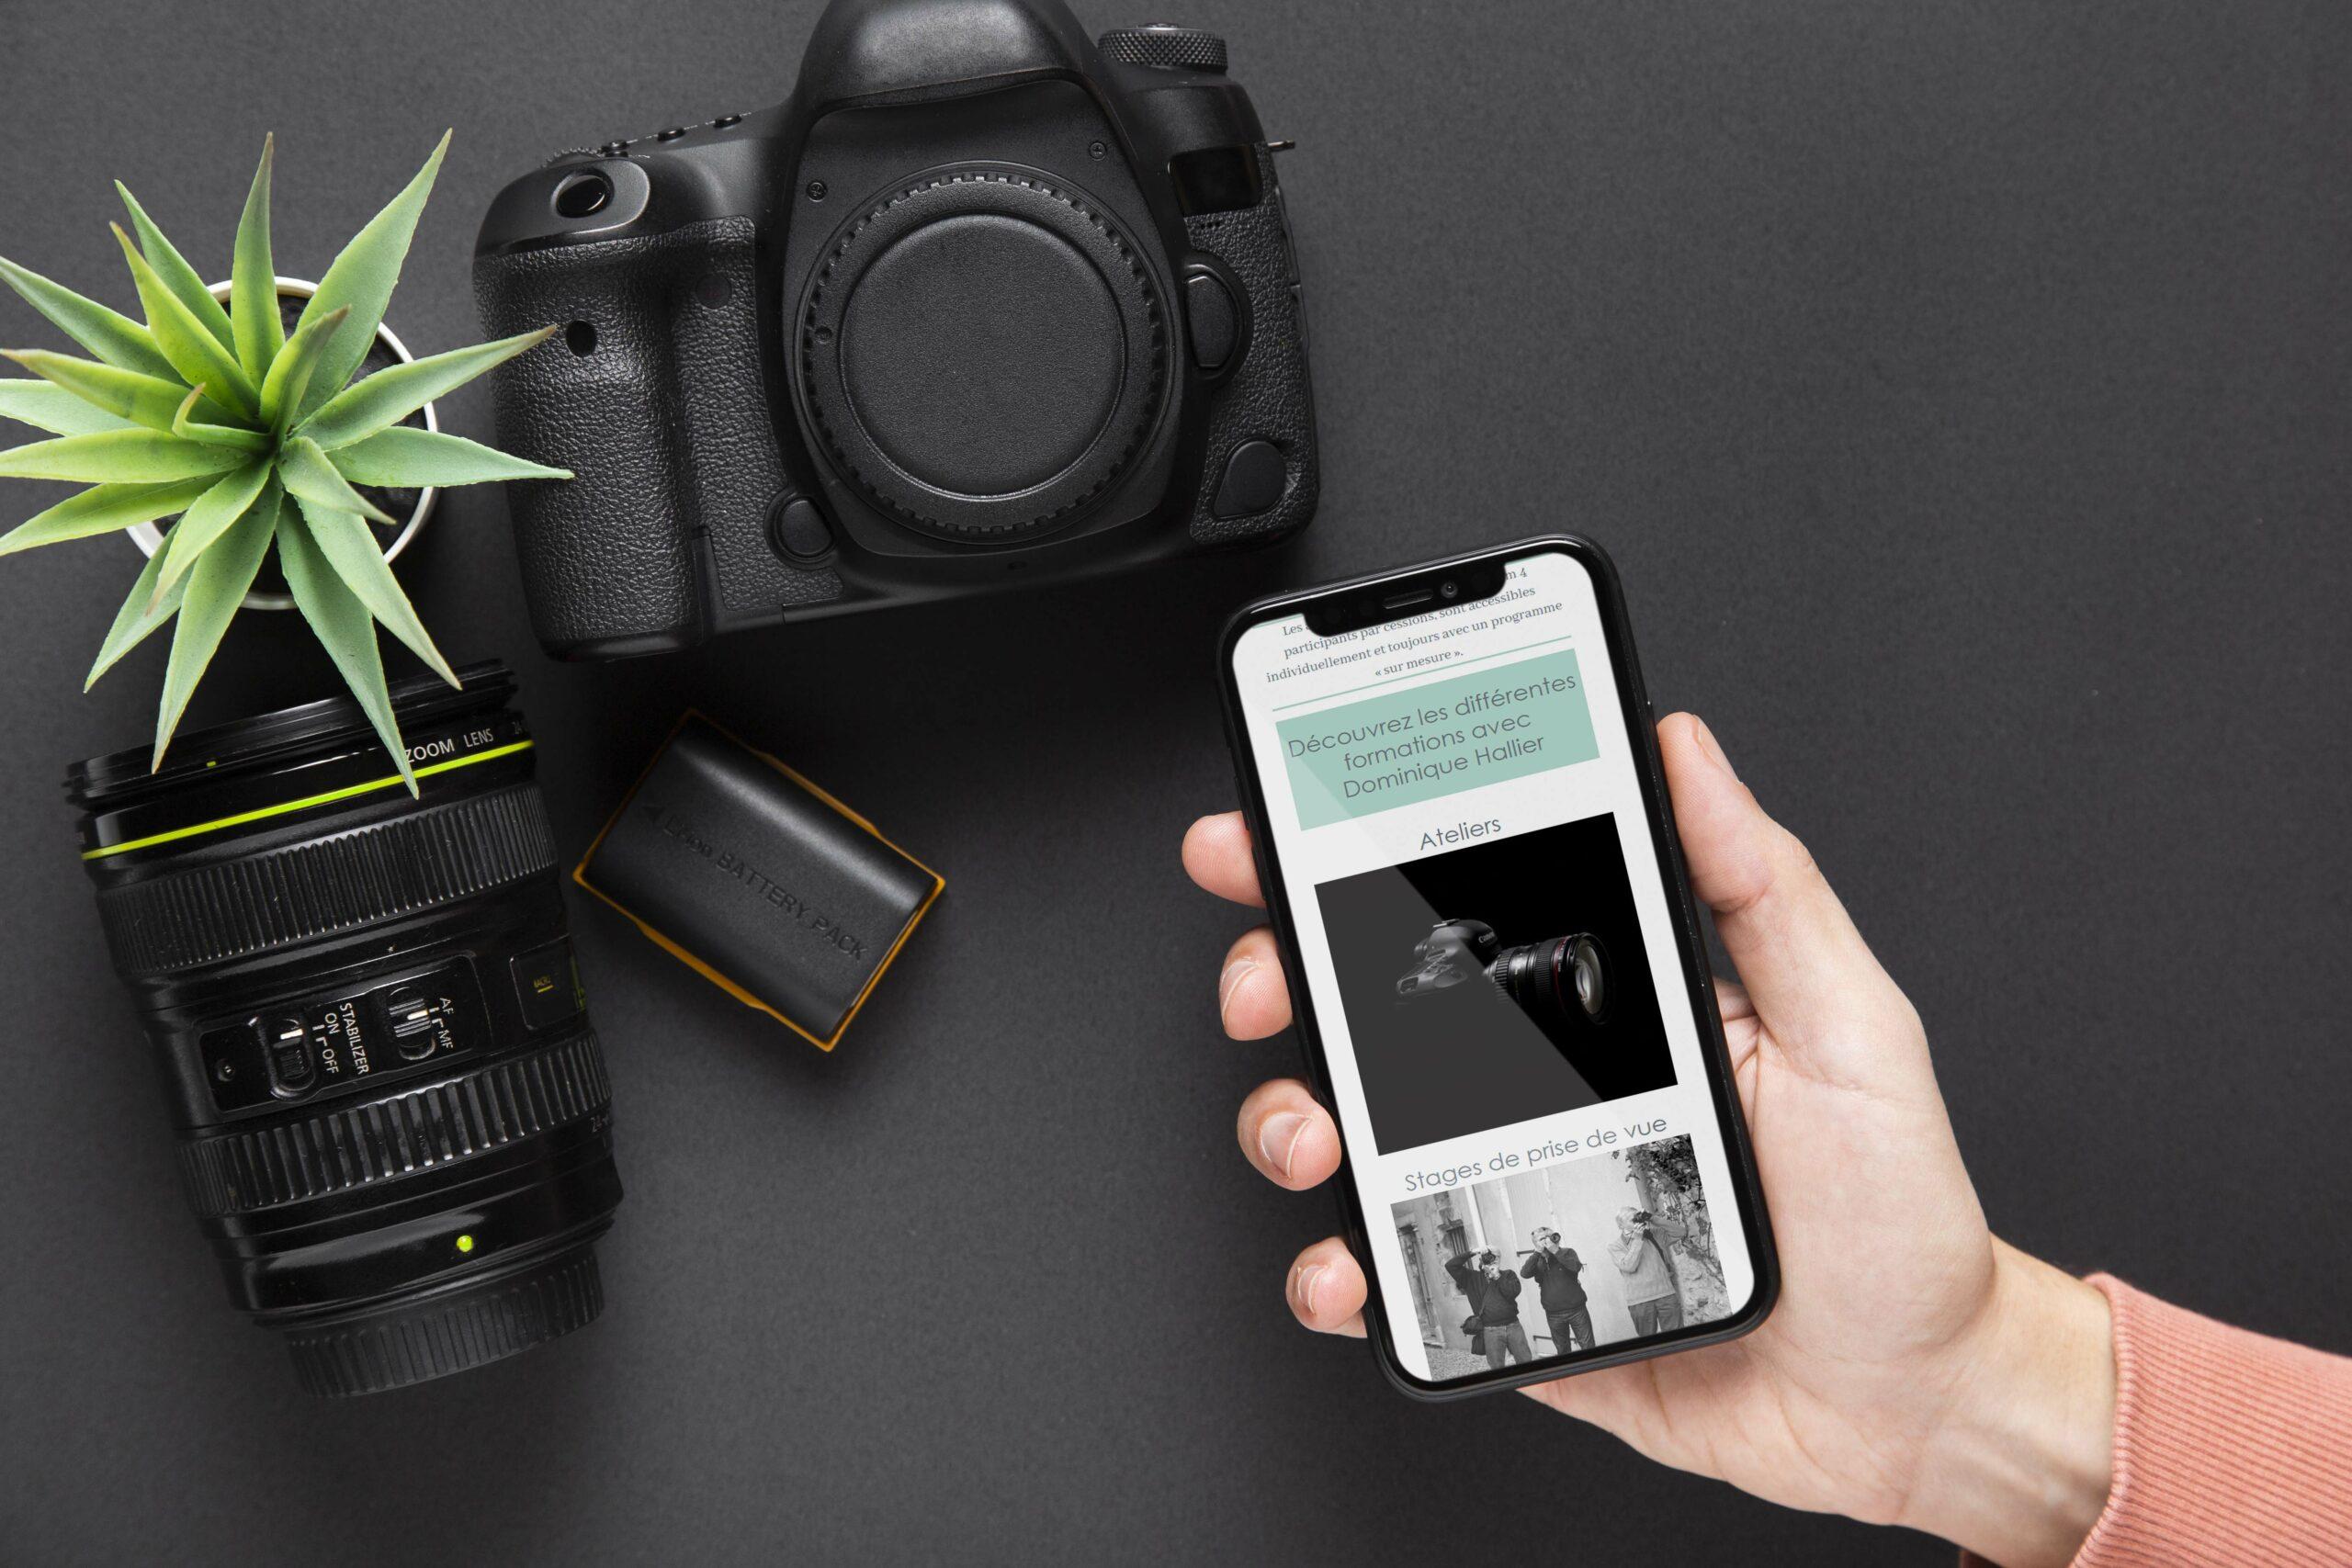 Instants d'images site responsive version mobile